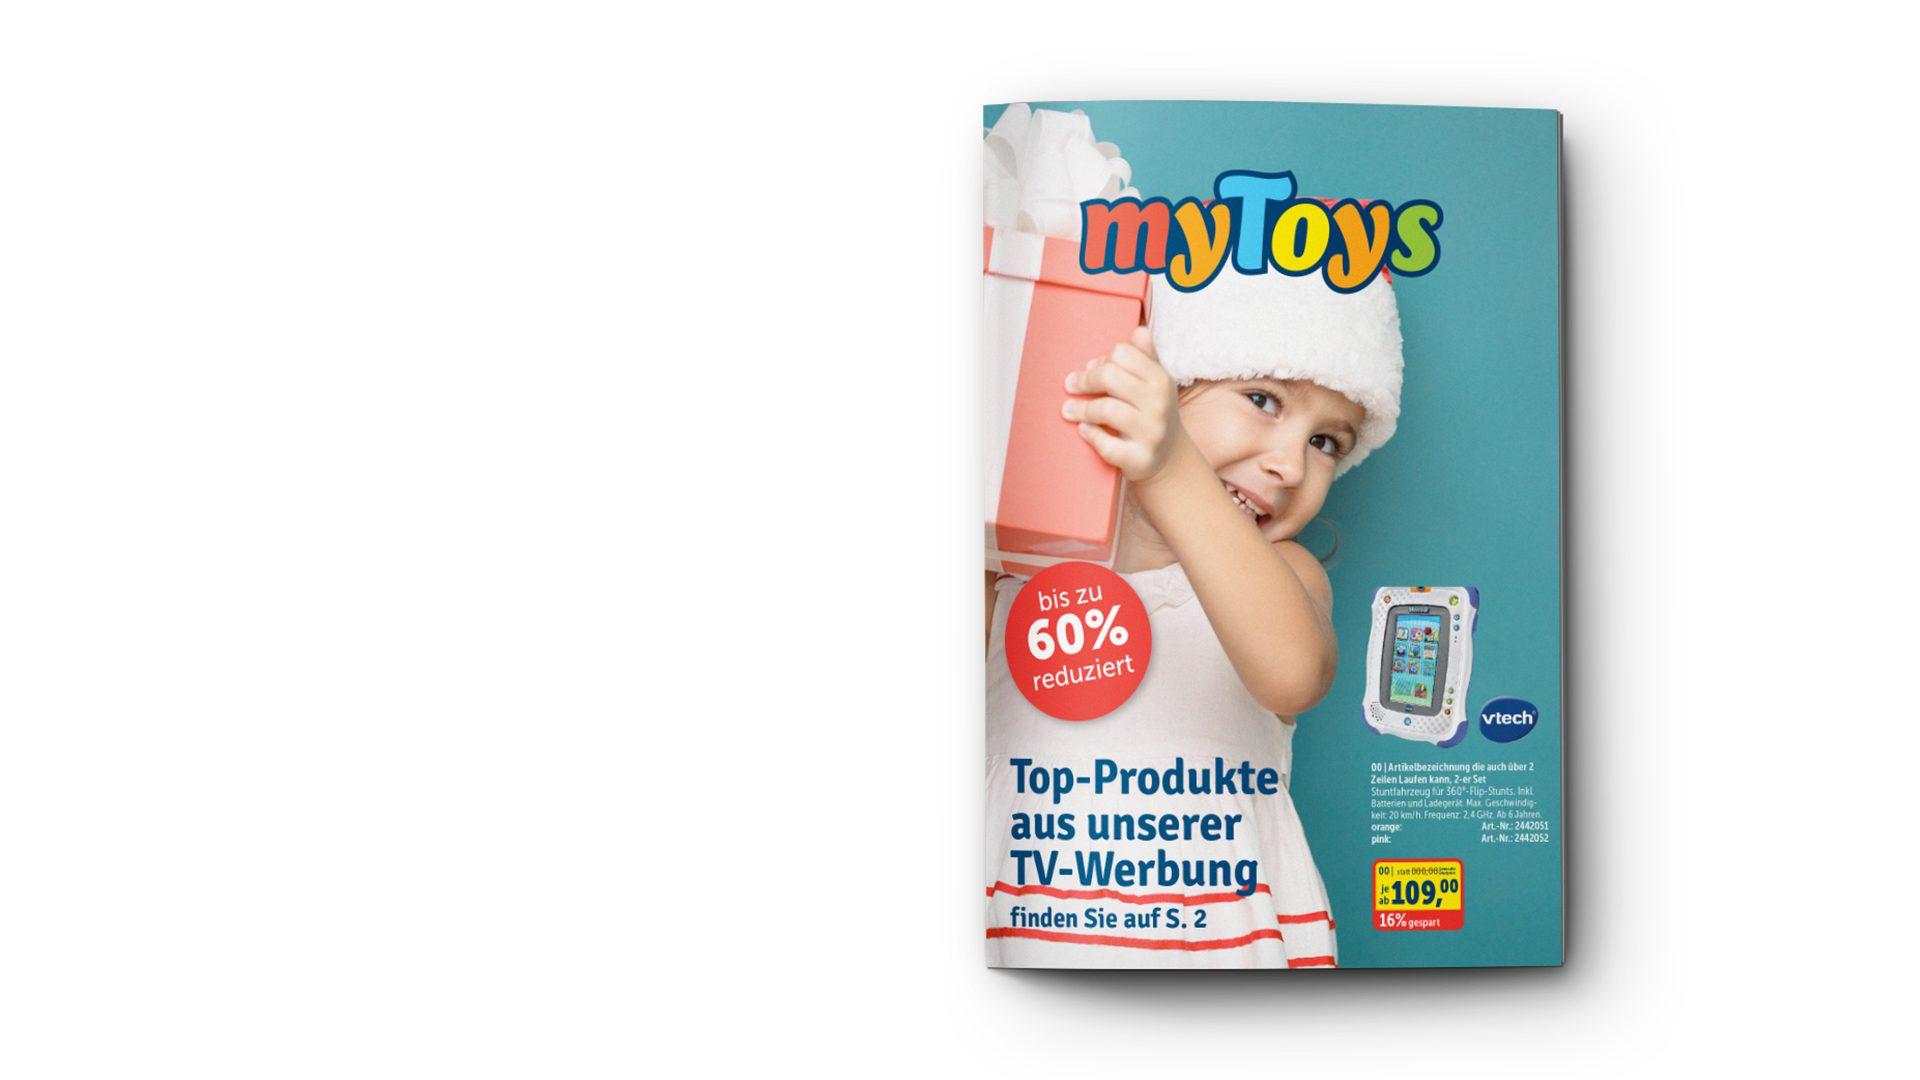 Titelseite des MyToys-Katalogs. Brand Design von Realgestalt